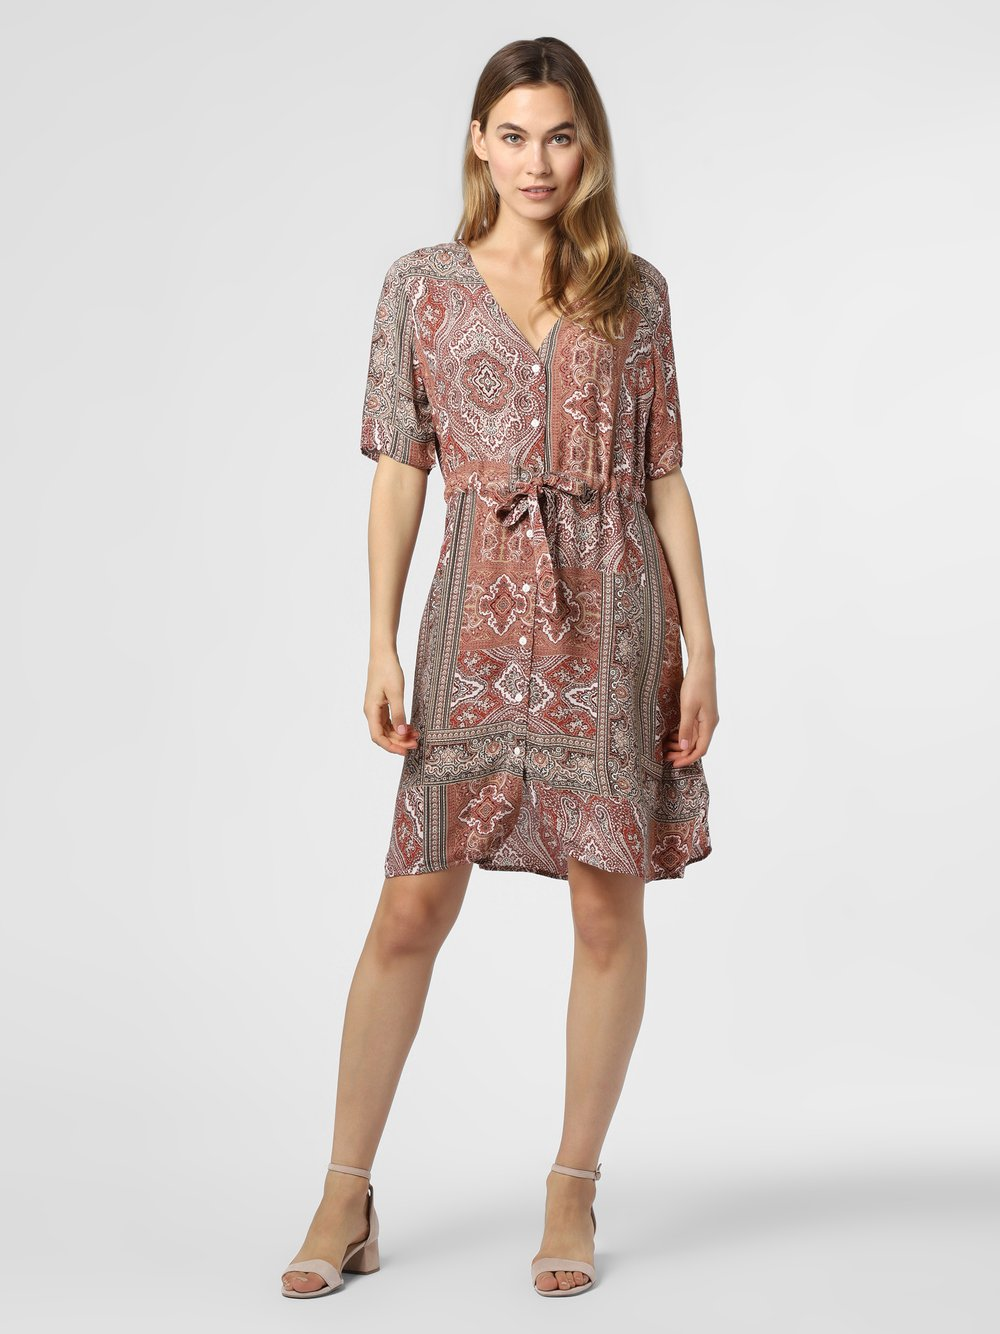 Minimum – Sukienka damska – Solally, czerwony Van Graaf 473308-0001-00360